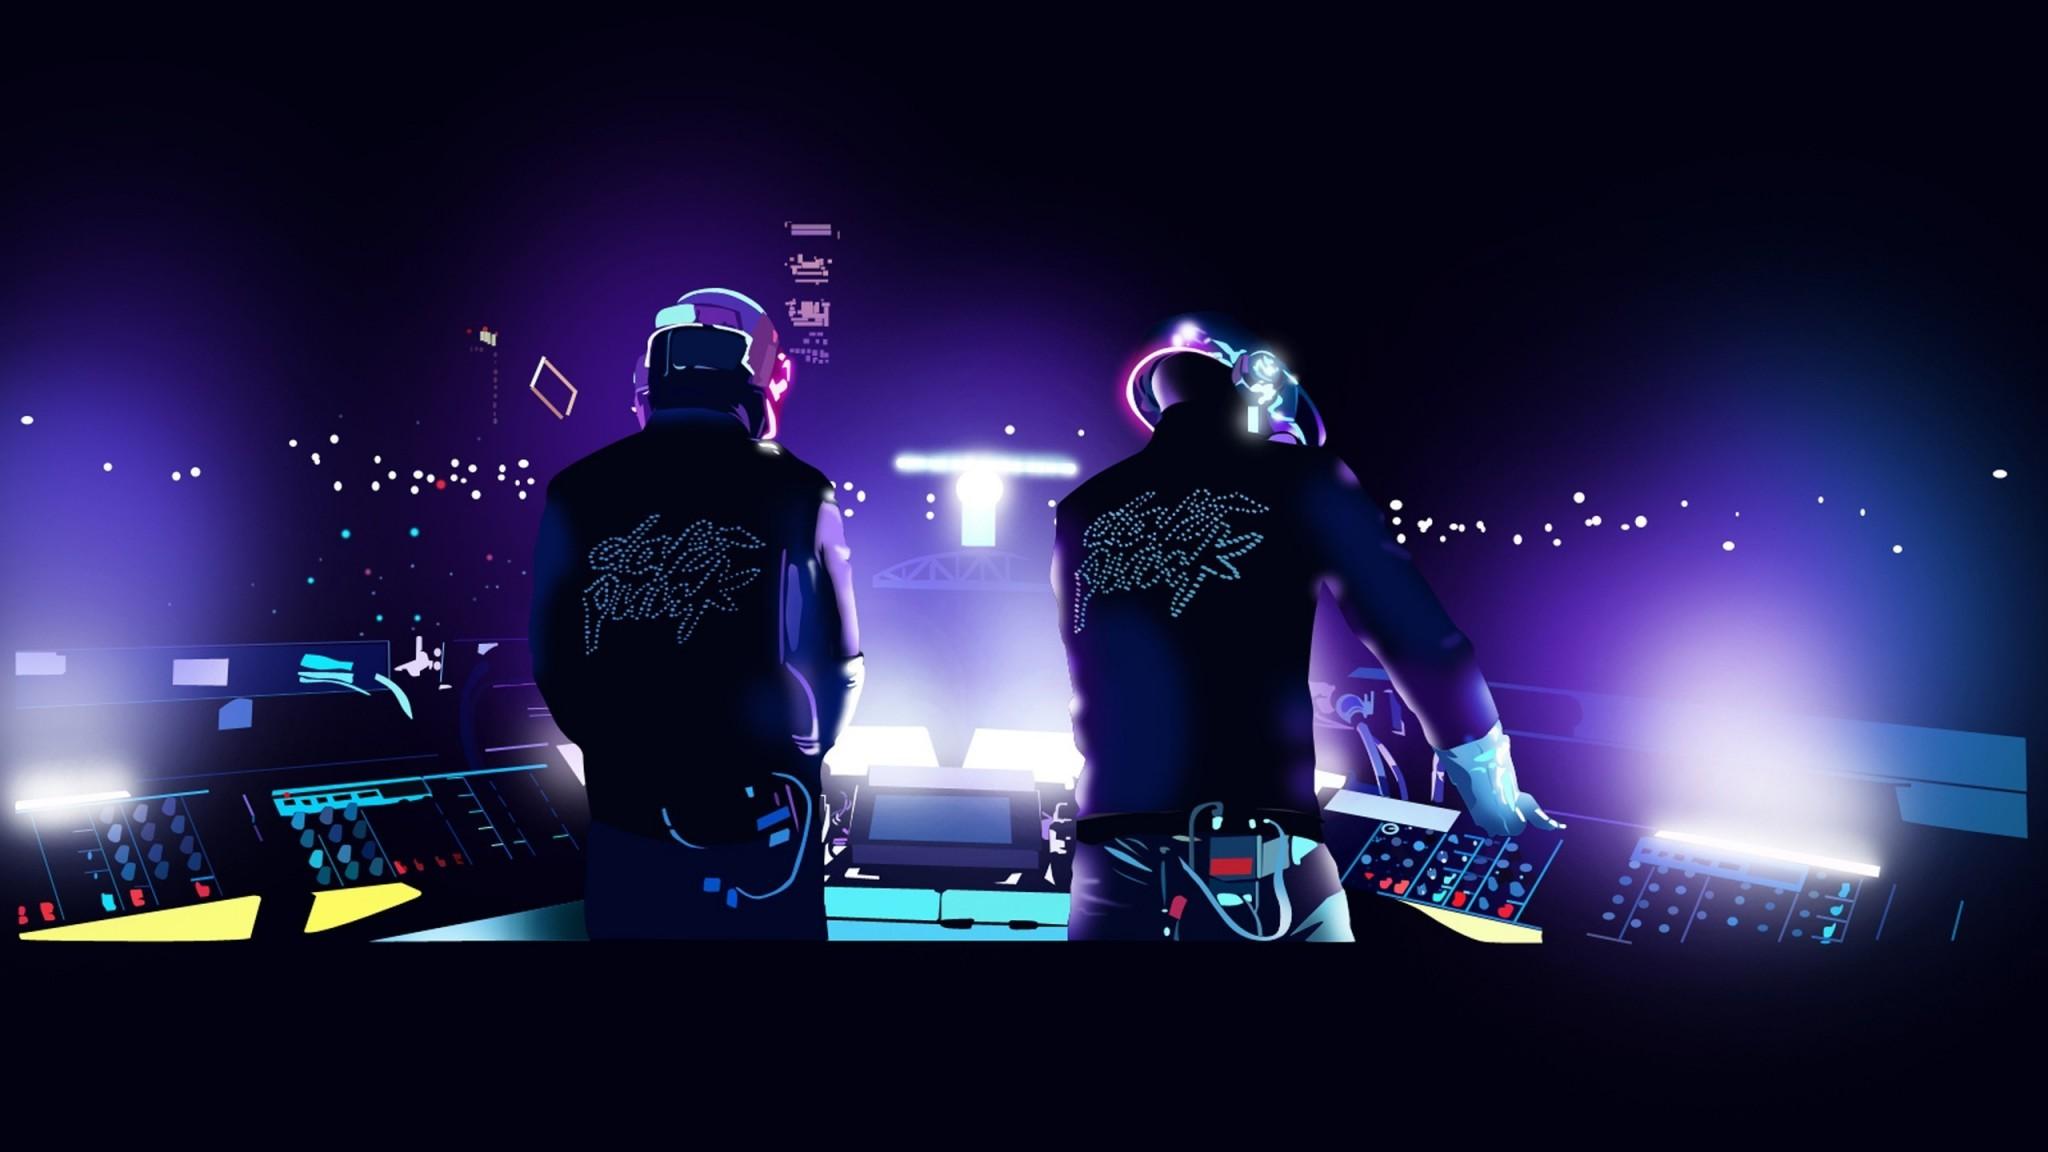 Daft Punk Style Elecrto Club Wide   skipwall  HD Wallpaper